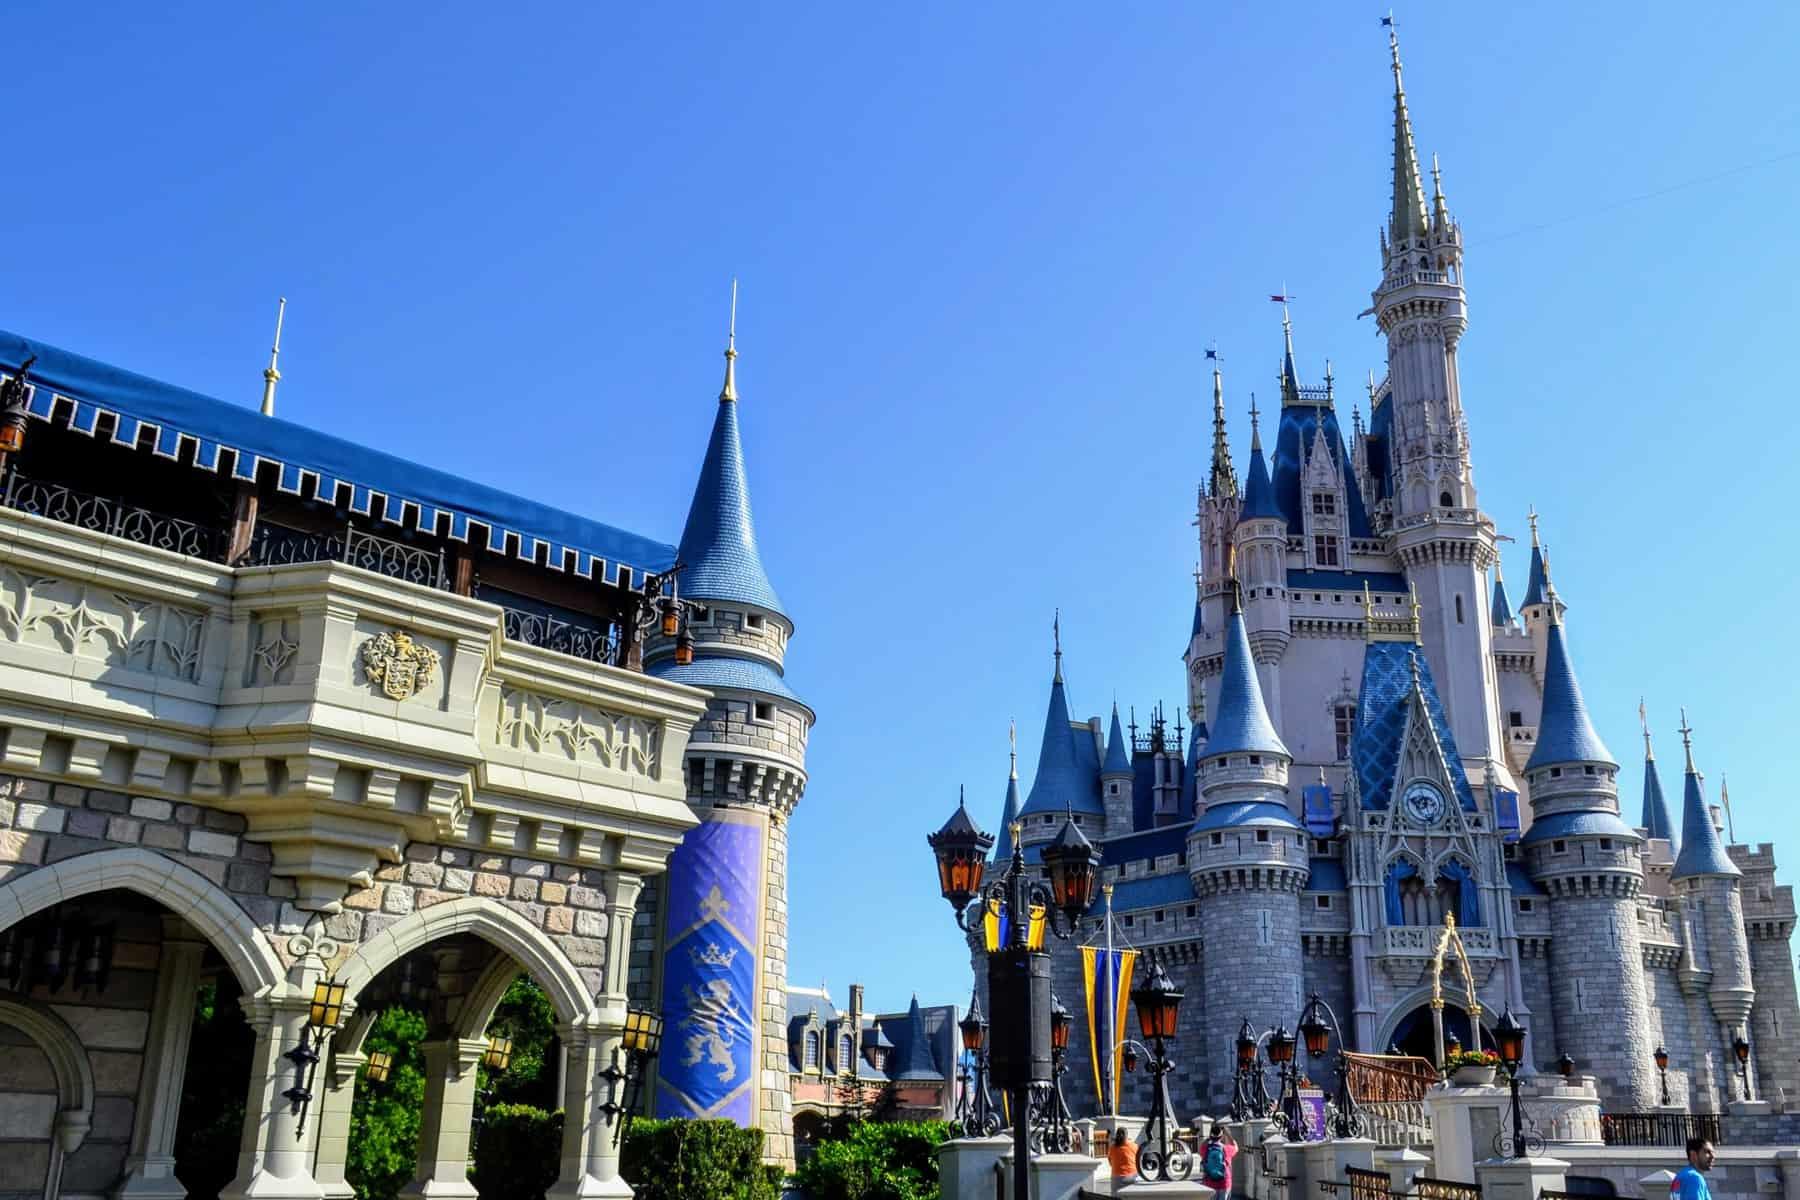 Build Your Own Disney Theme Park-Style Buttons | Wdw Prep School